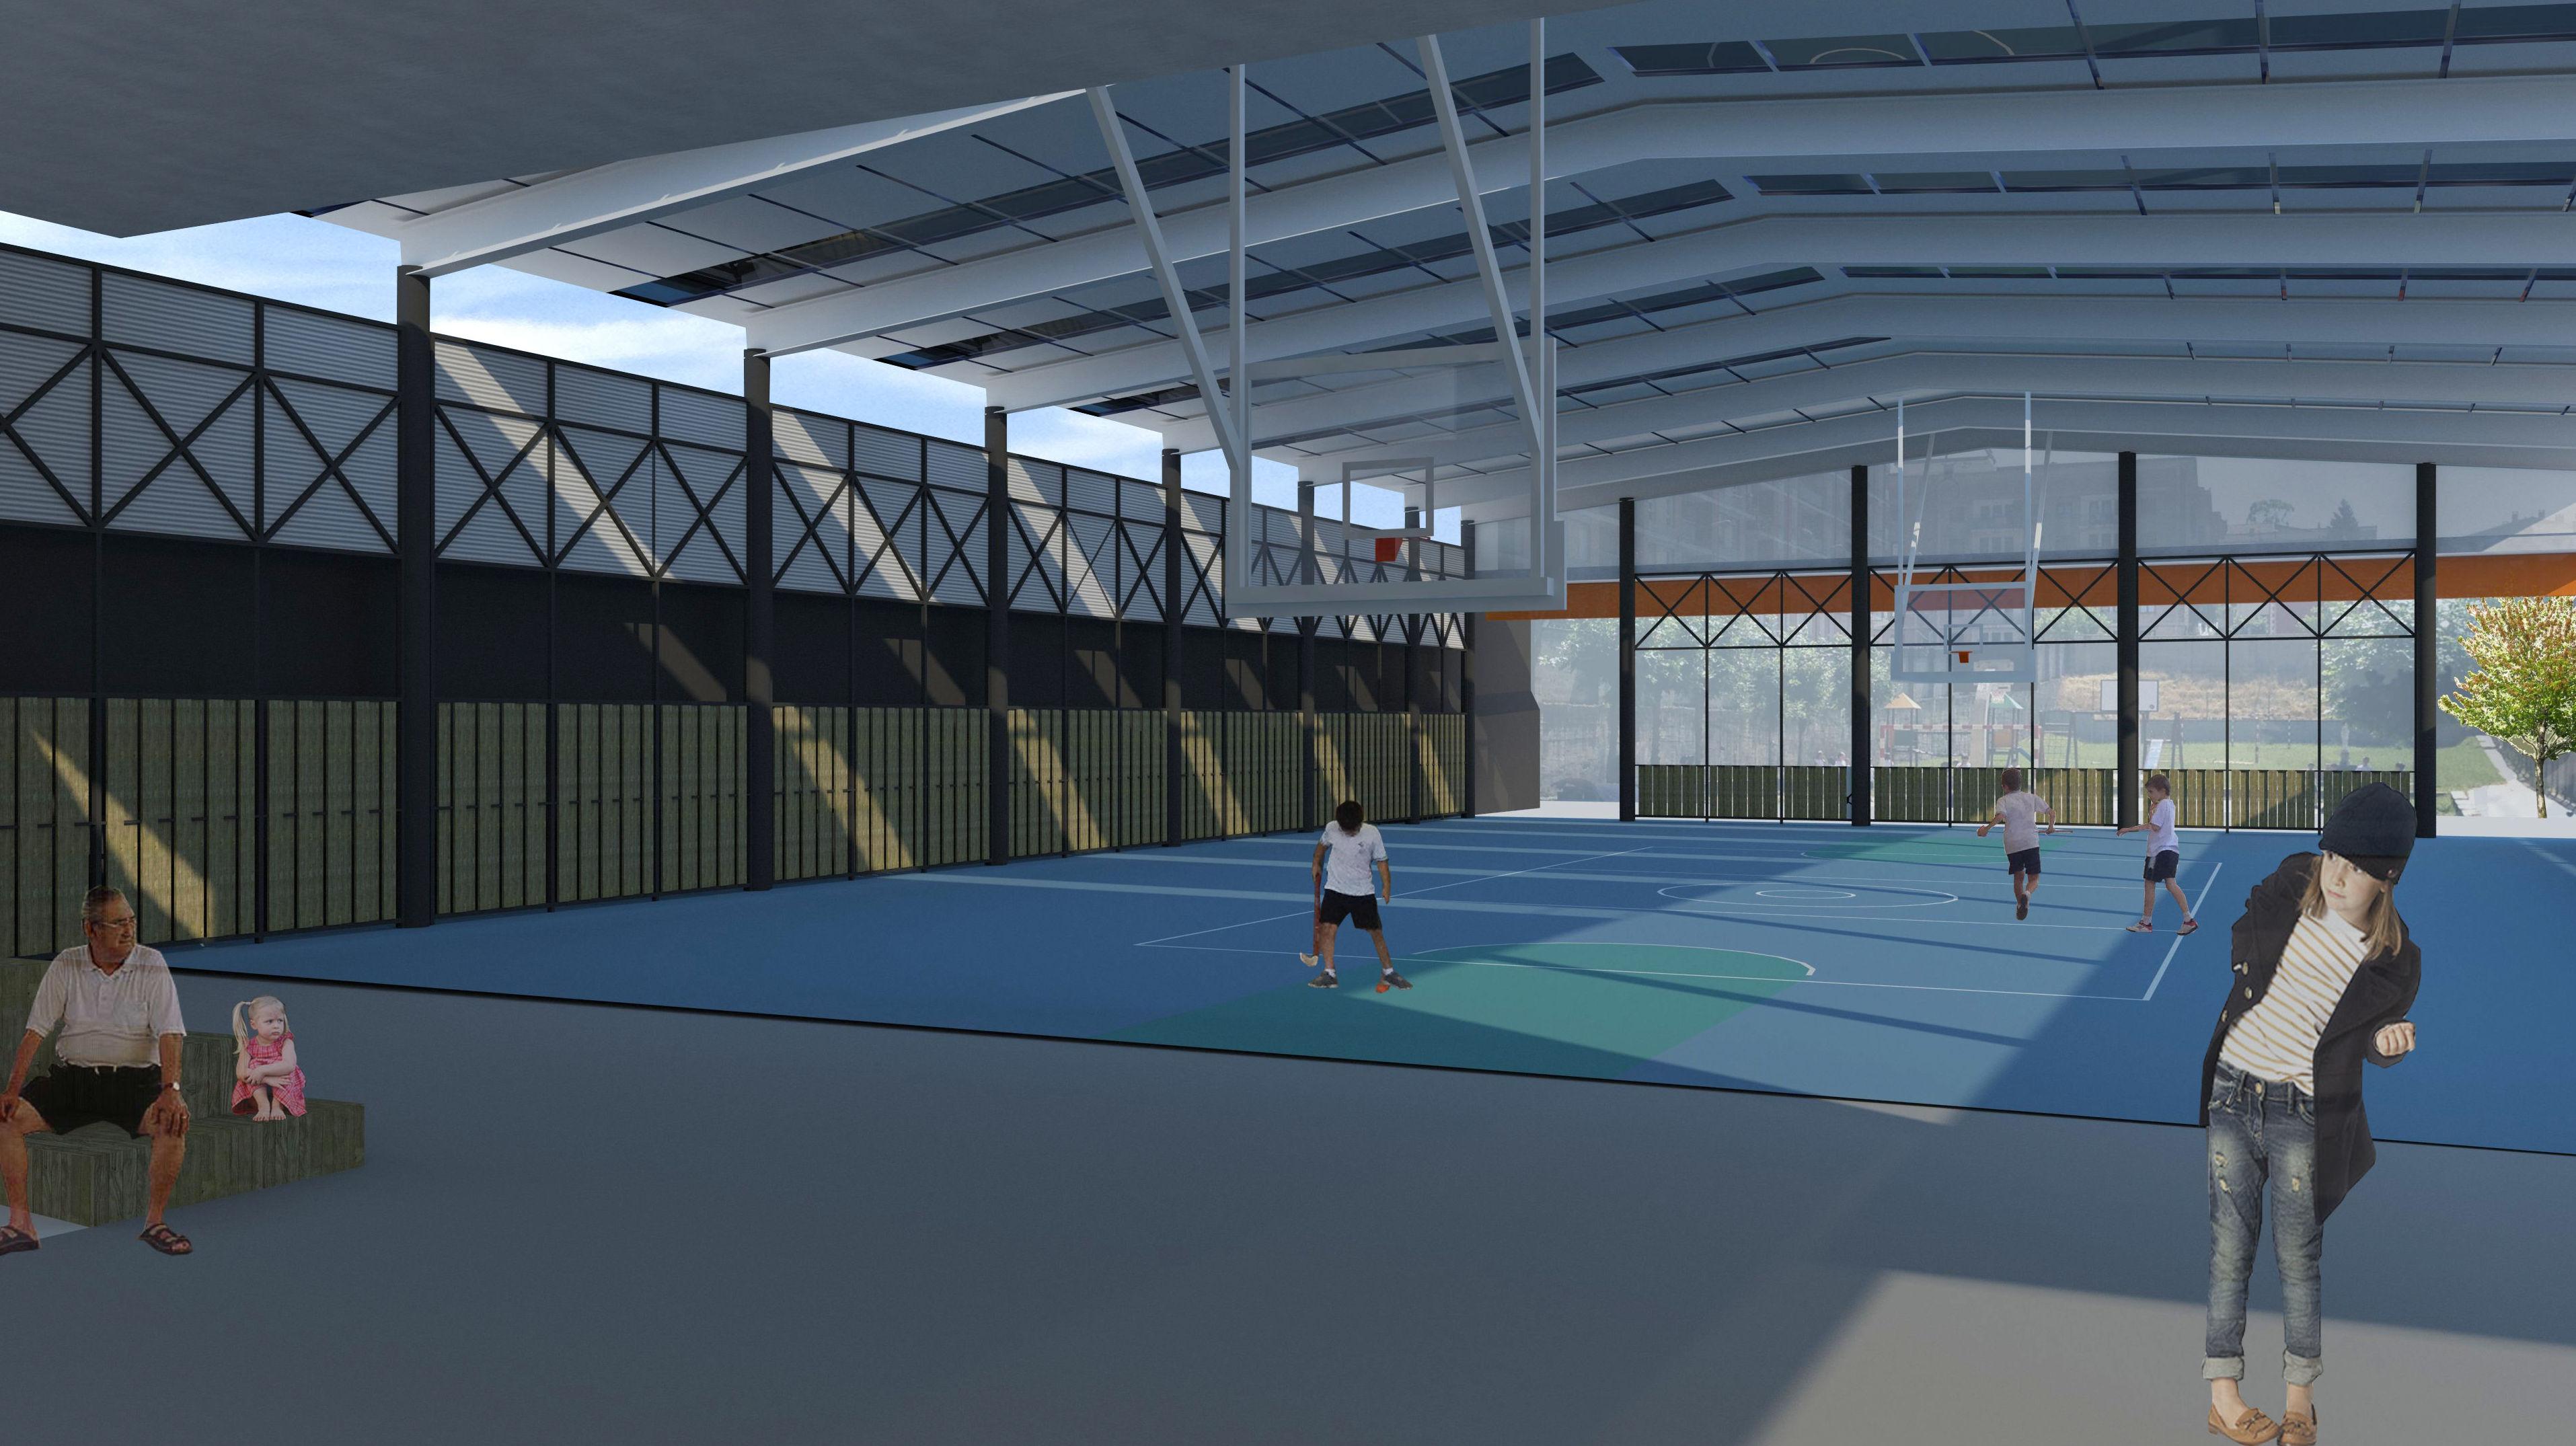 Reforma de la zona deportiva del colegio San Antonio y Santa Rita ikastetxea (Durango)